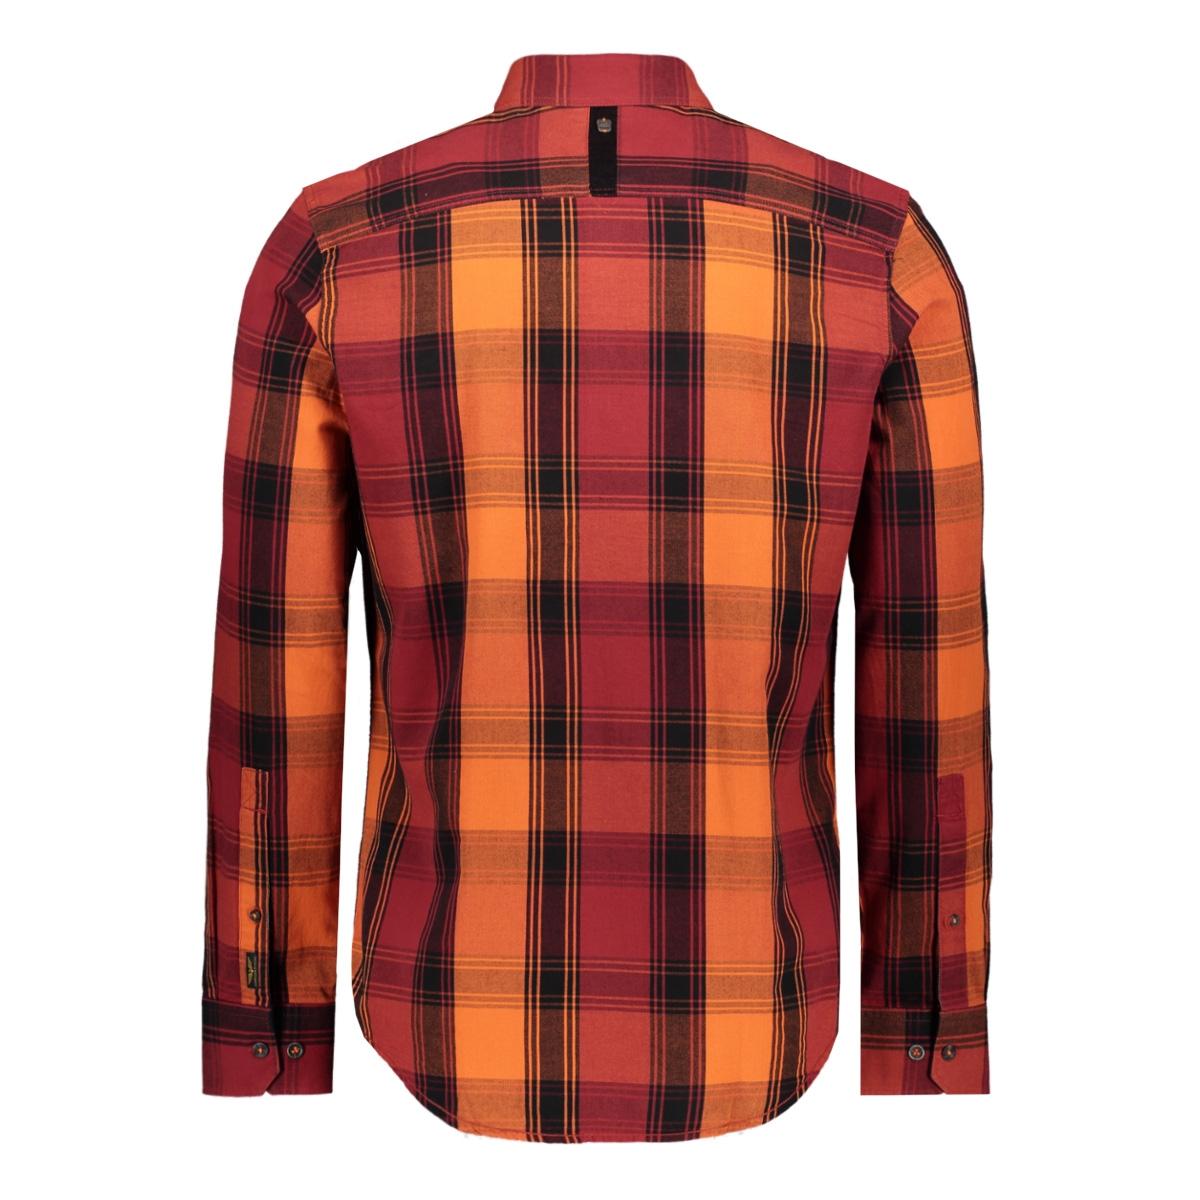 long sleeve shirt psi197211 pme legend overhemd 2119